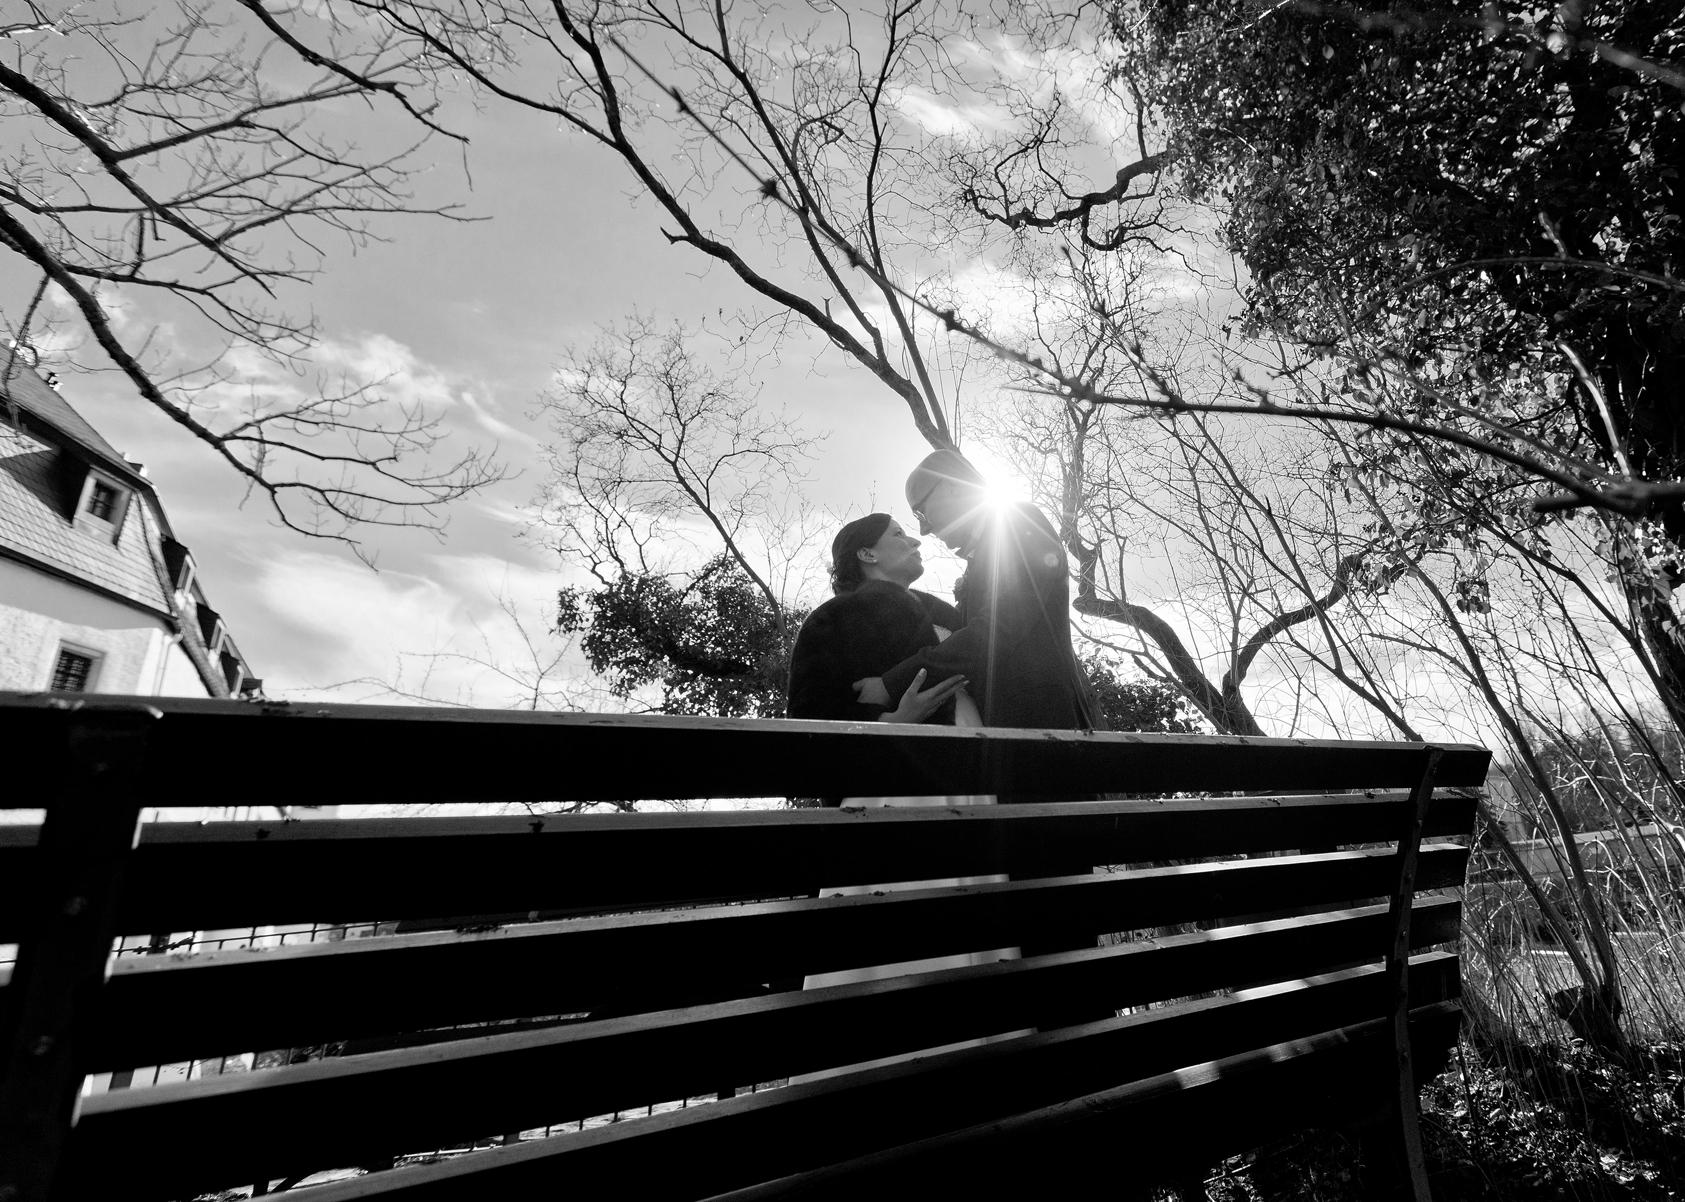 Hochzeitsfotograf schloss wildeck zschopau